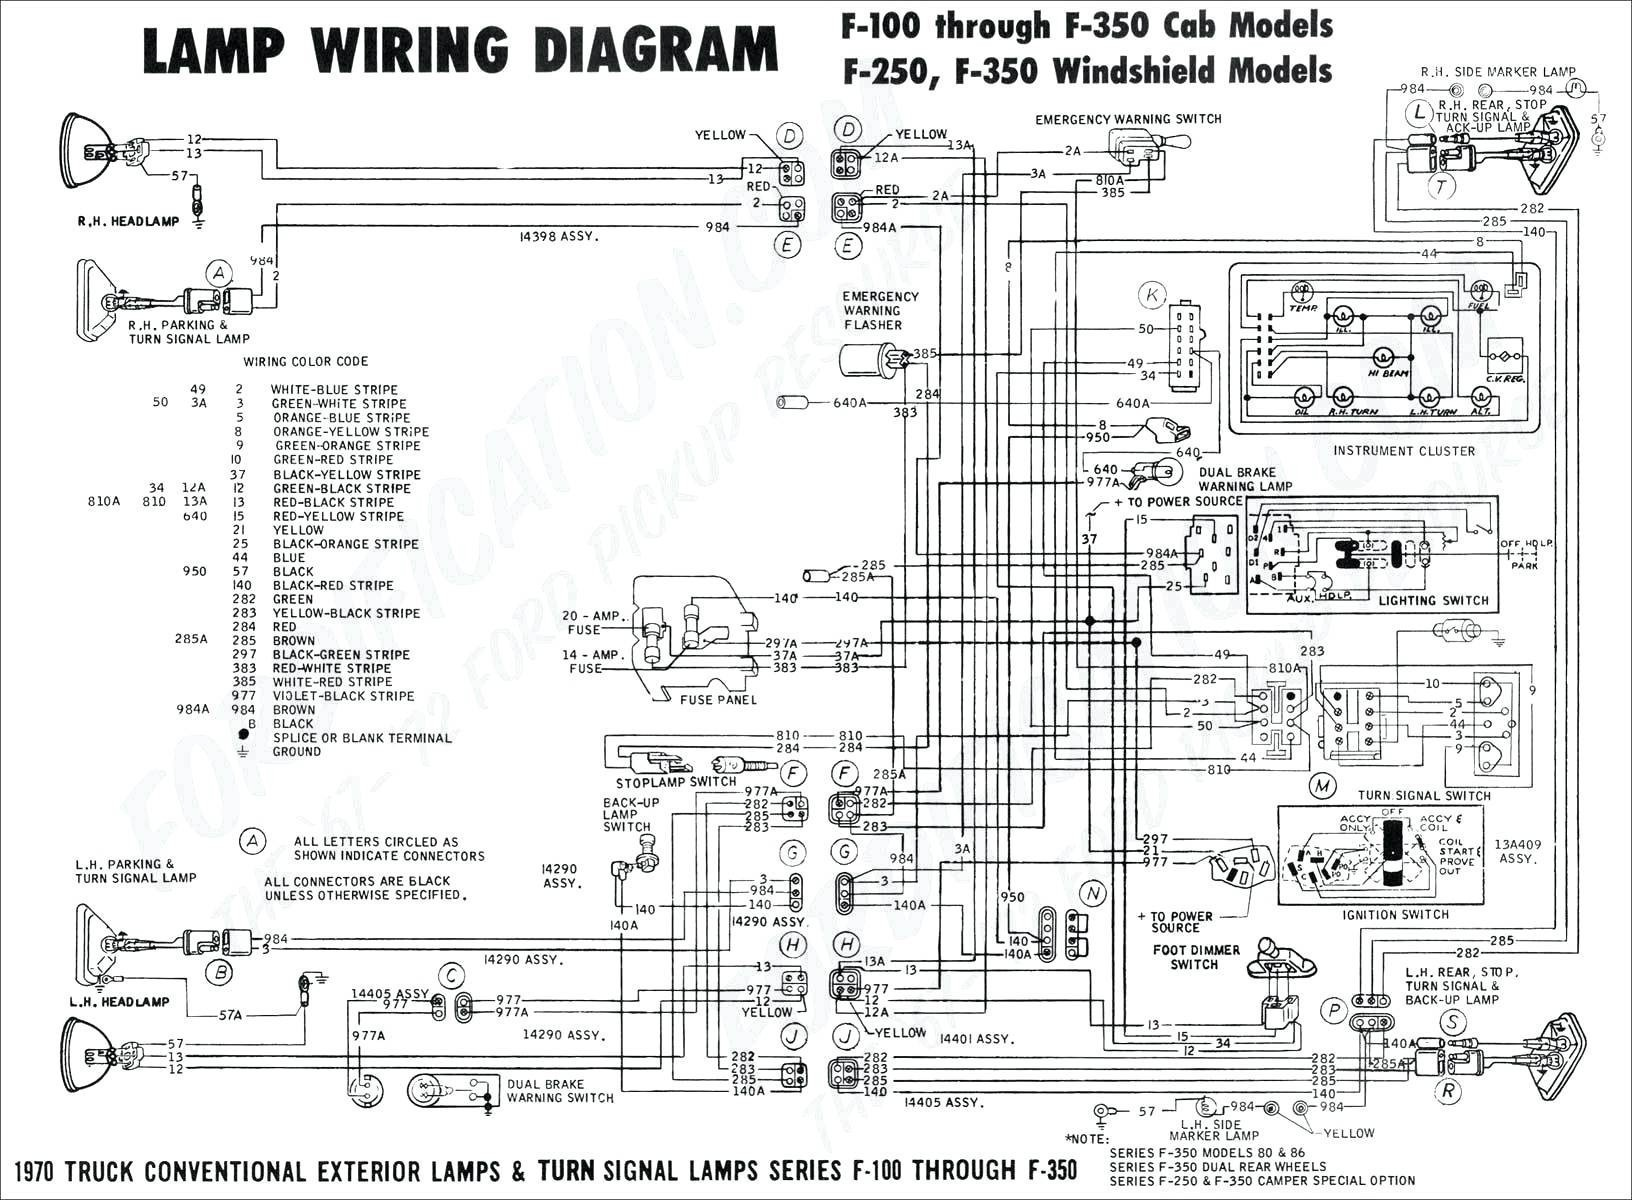 2002 ford Focus Se Engine Diagram 2002 ford F 350 Wiring Diagram Data Wiring Diagrams • Of 2002 ford Focus Se Engine Diagram